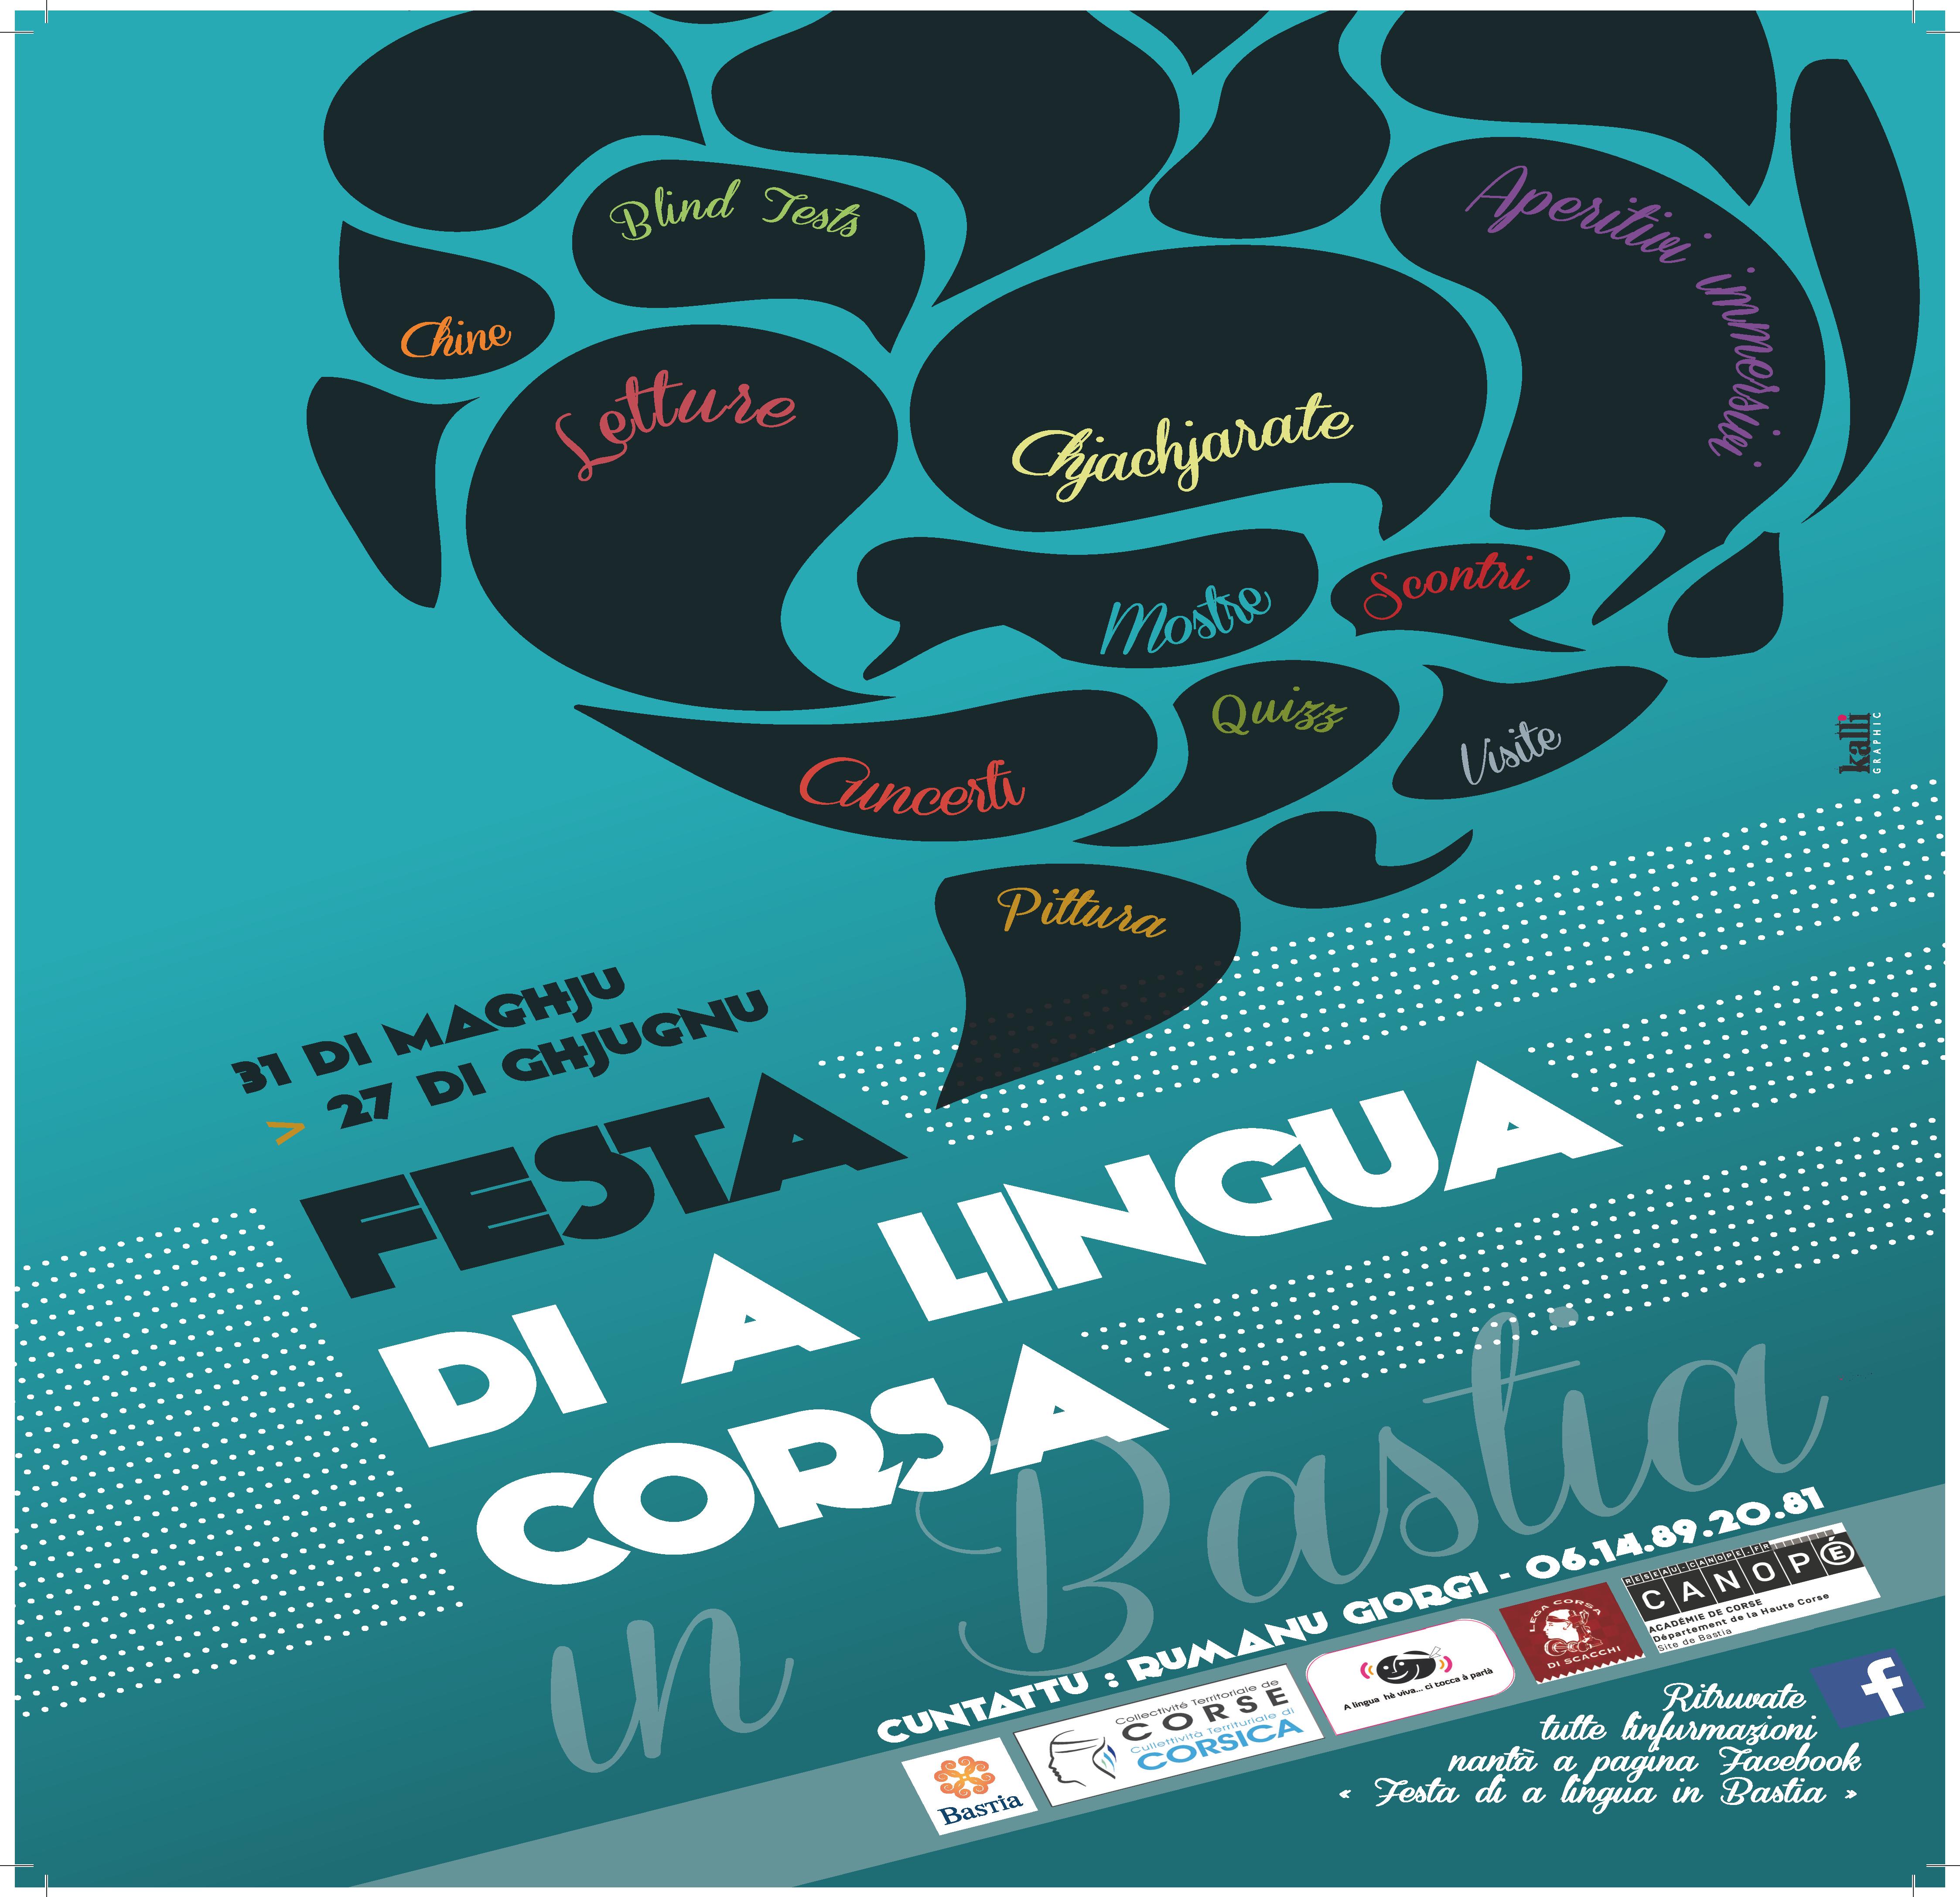 Festa di a lingua corsa in Bastia : Tout le programme